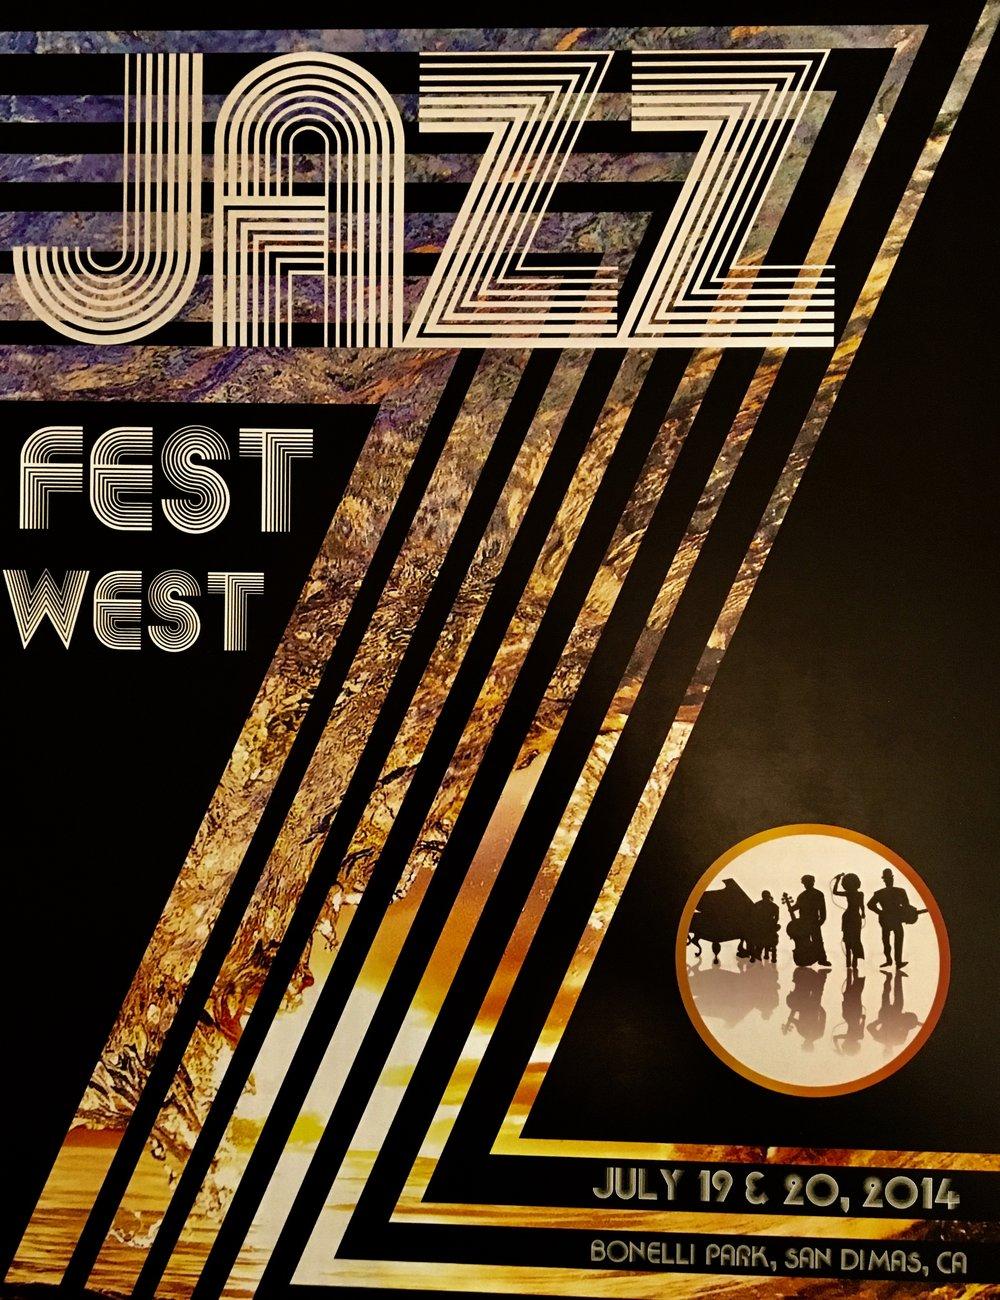 13c377d2de43-Jazz_Fest_Poster.jpg